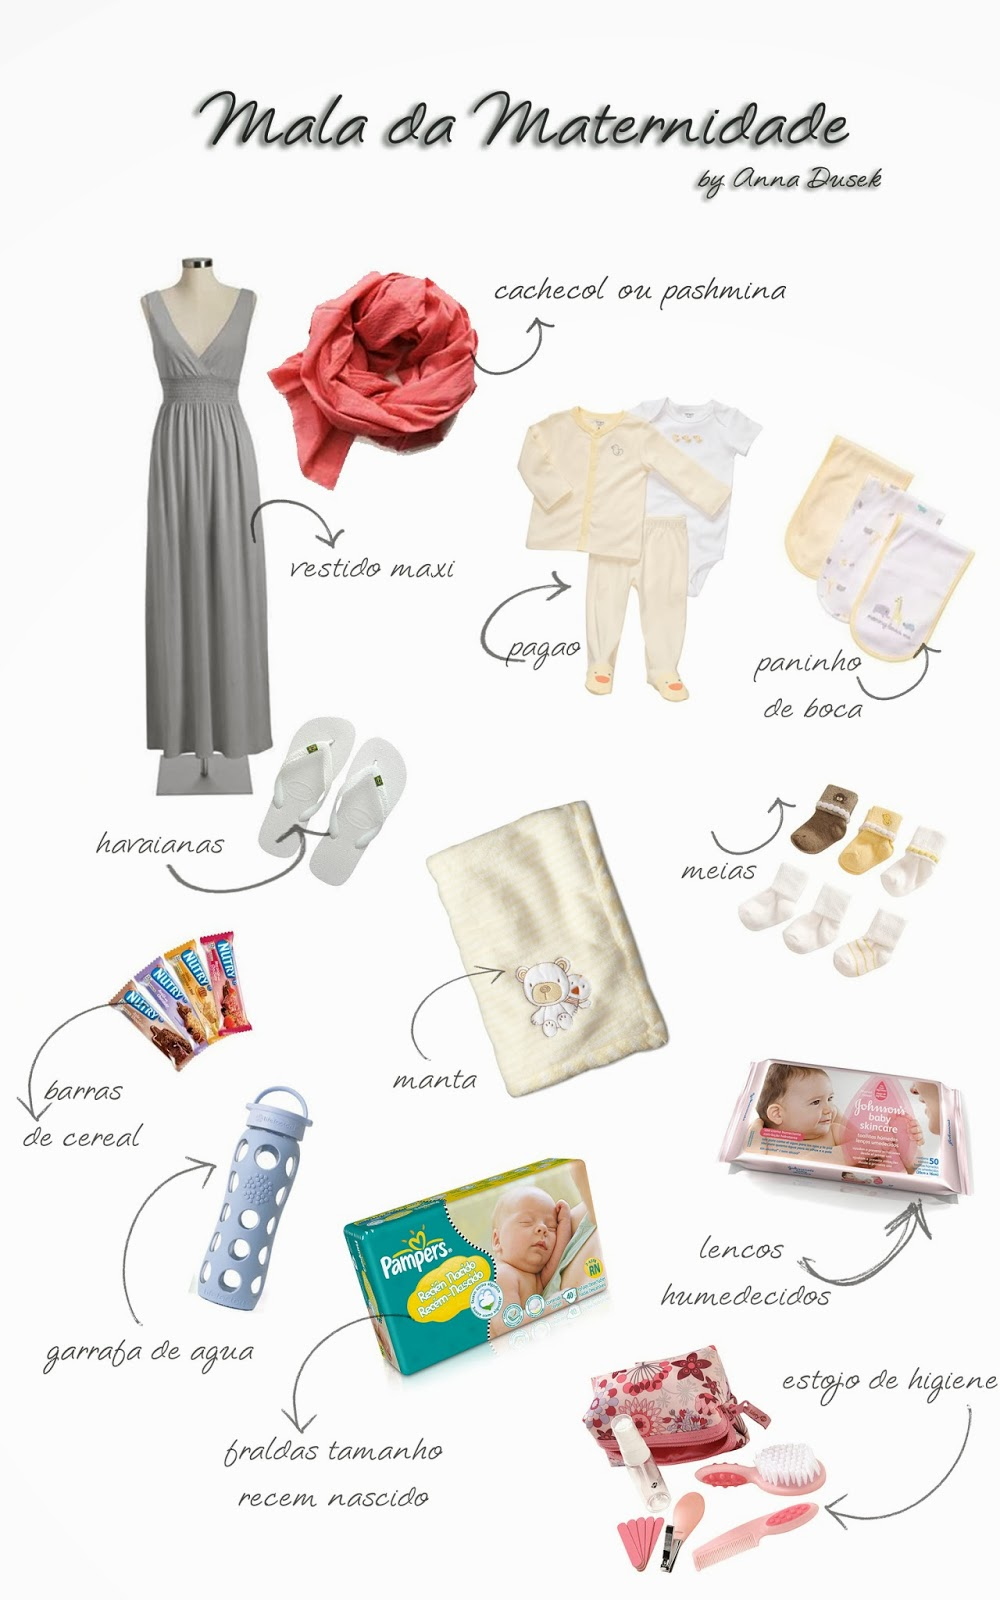 O que levar para a maternidade primeiros dias - Anna Dusek